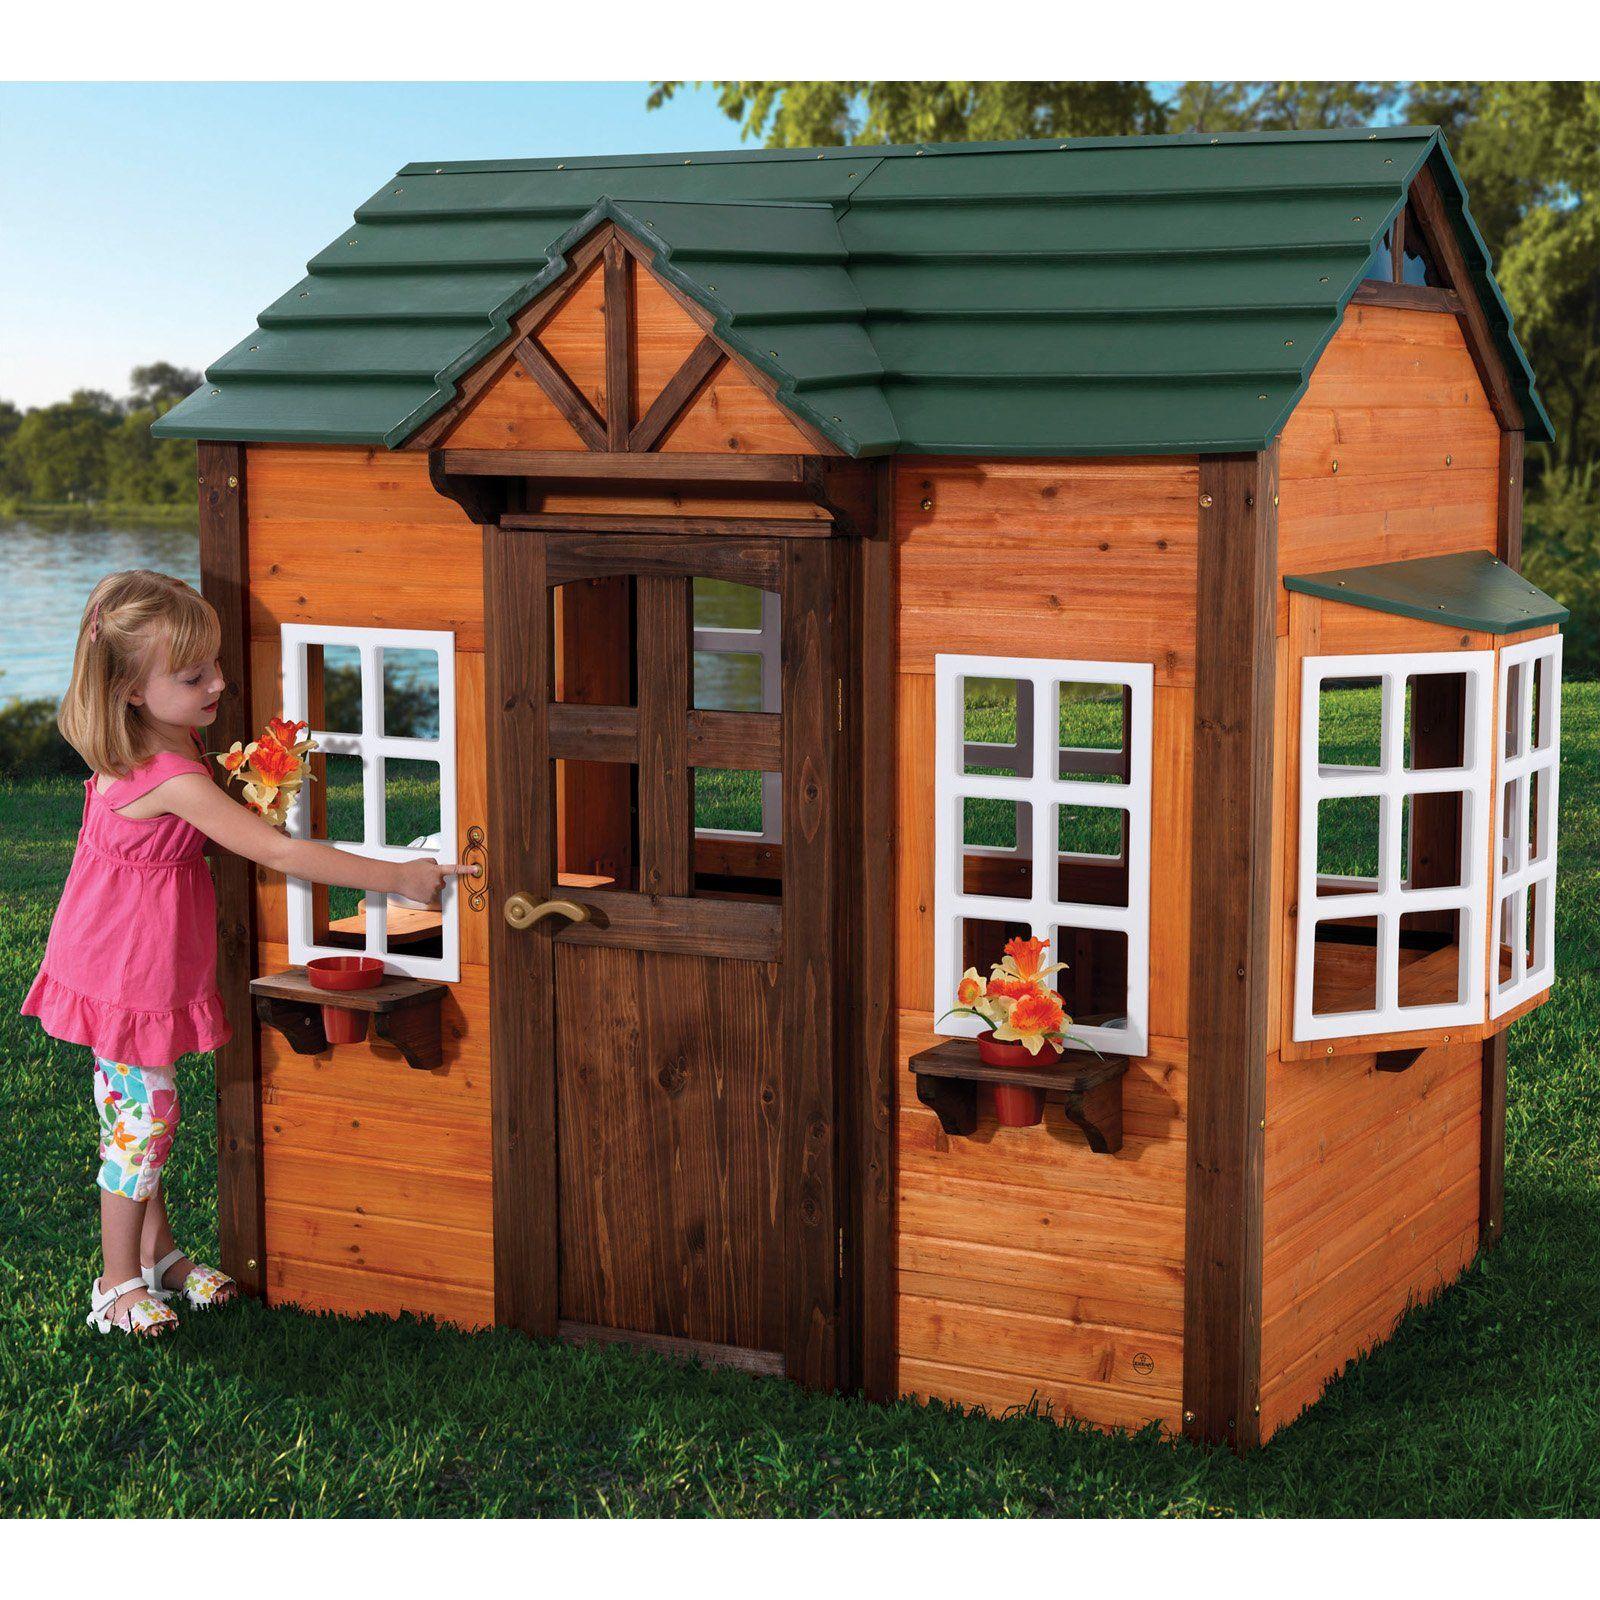 KidKraft My Woodland Playhouse Outdoor Playhouses